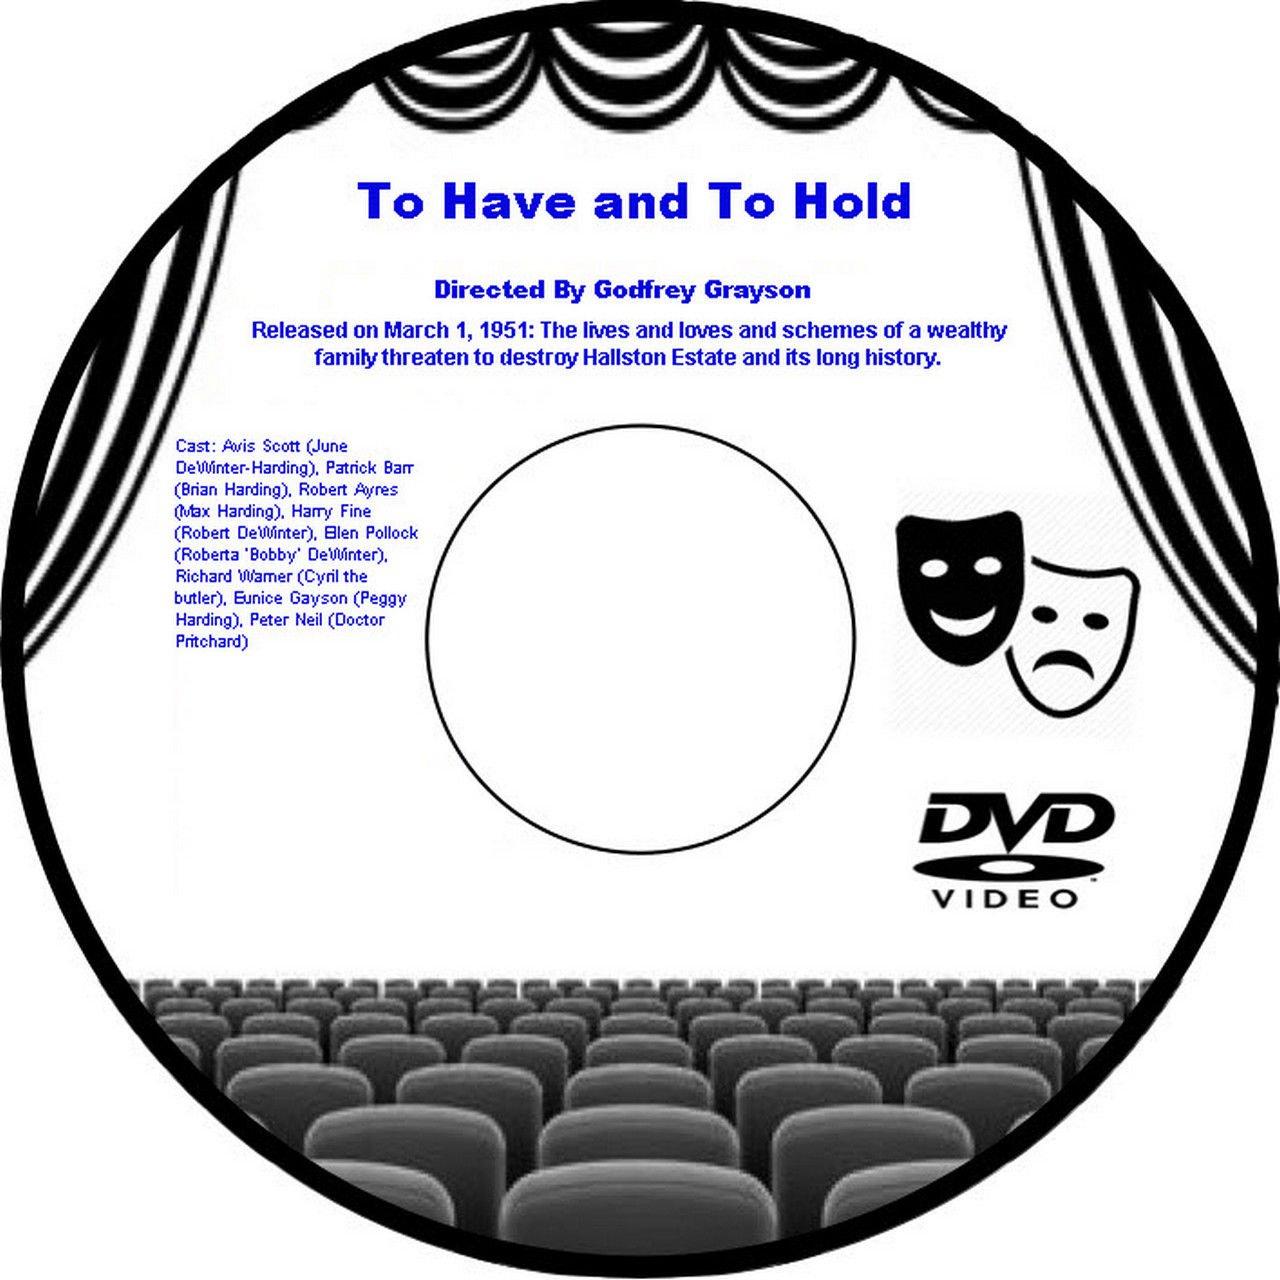 To Have and To Hold 1951 DVD Film Drama Godfrey Grayson Avis Scott (June DeWinte